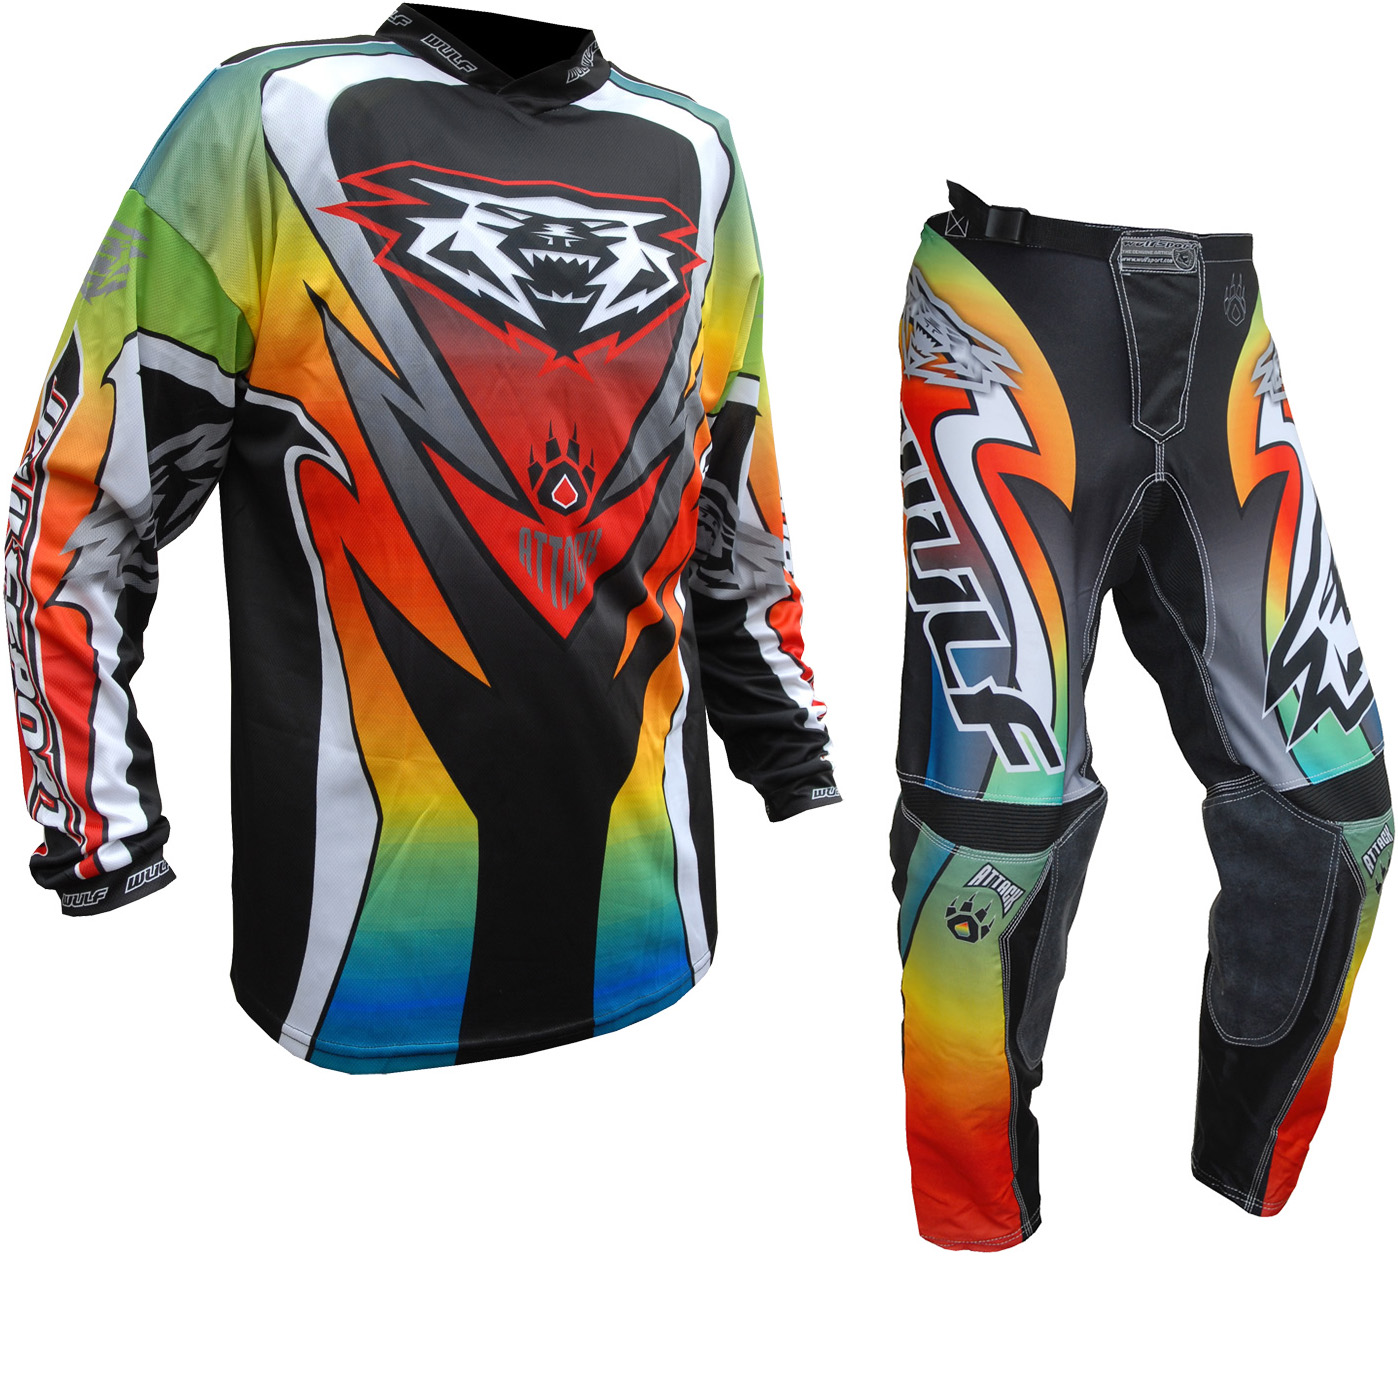 Adult motocross